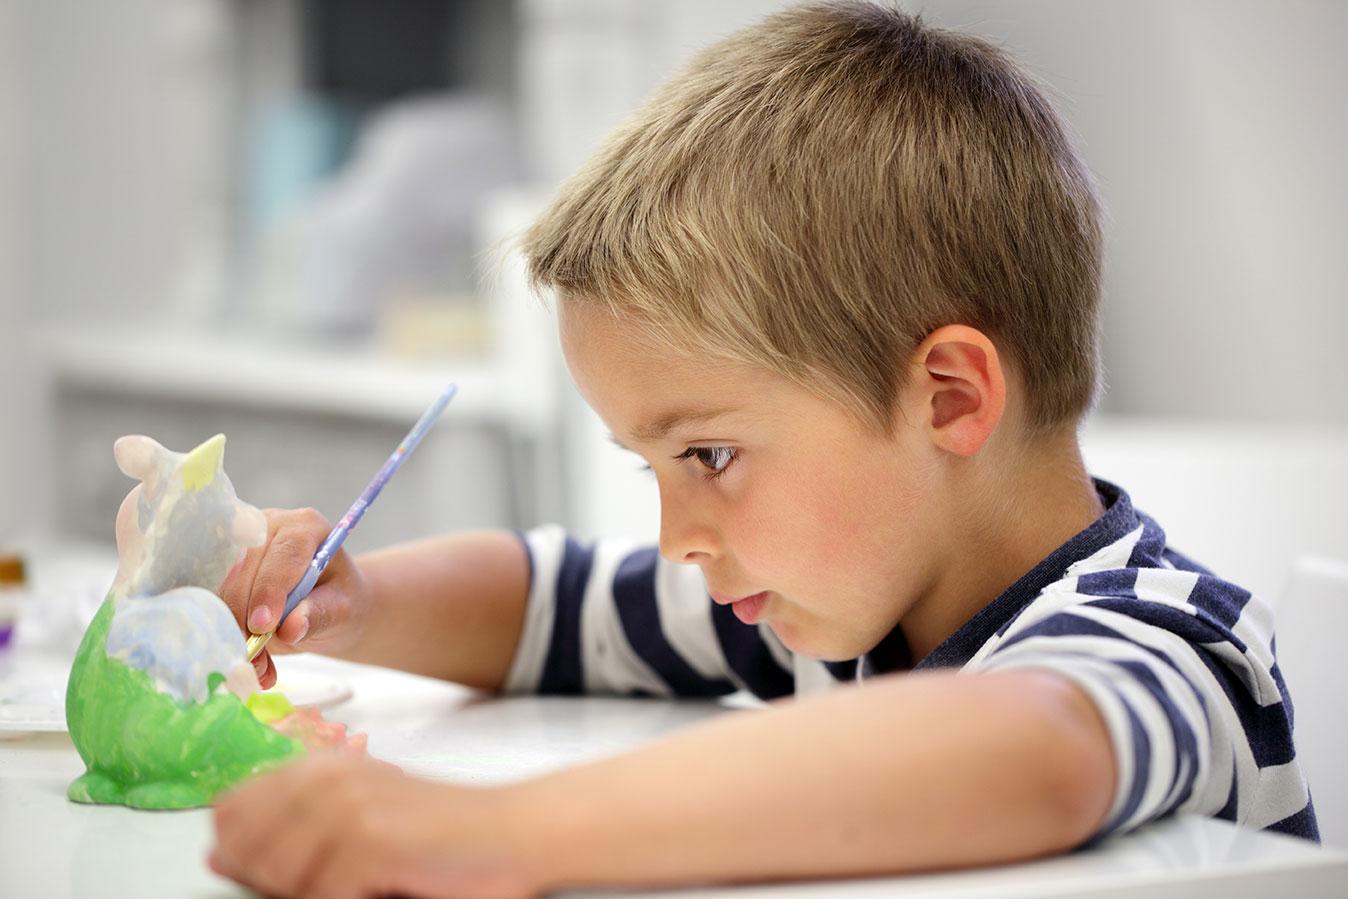 Kind beim Keramikmalen im Keramikmalstudio Eigenlob